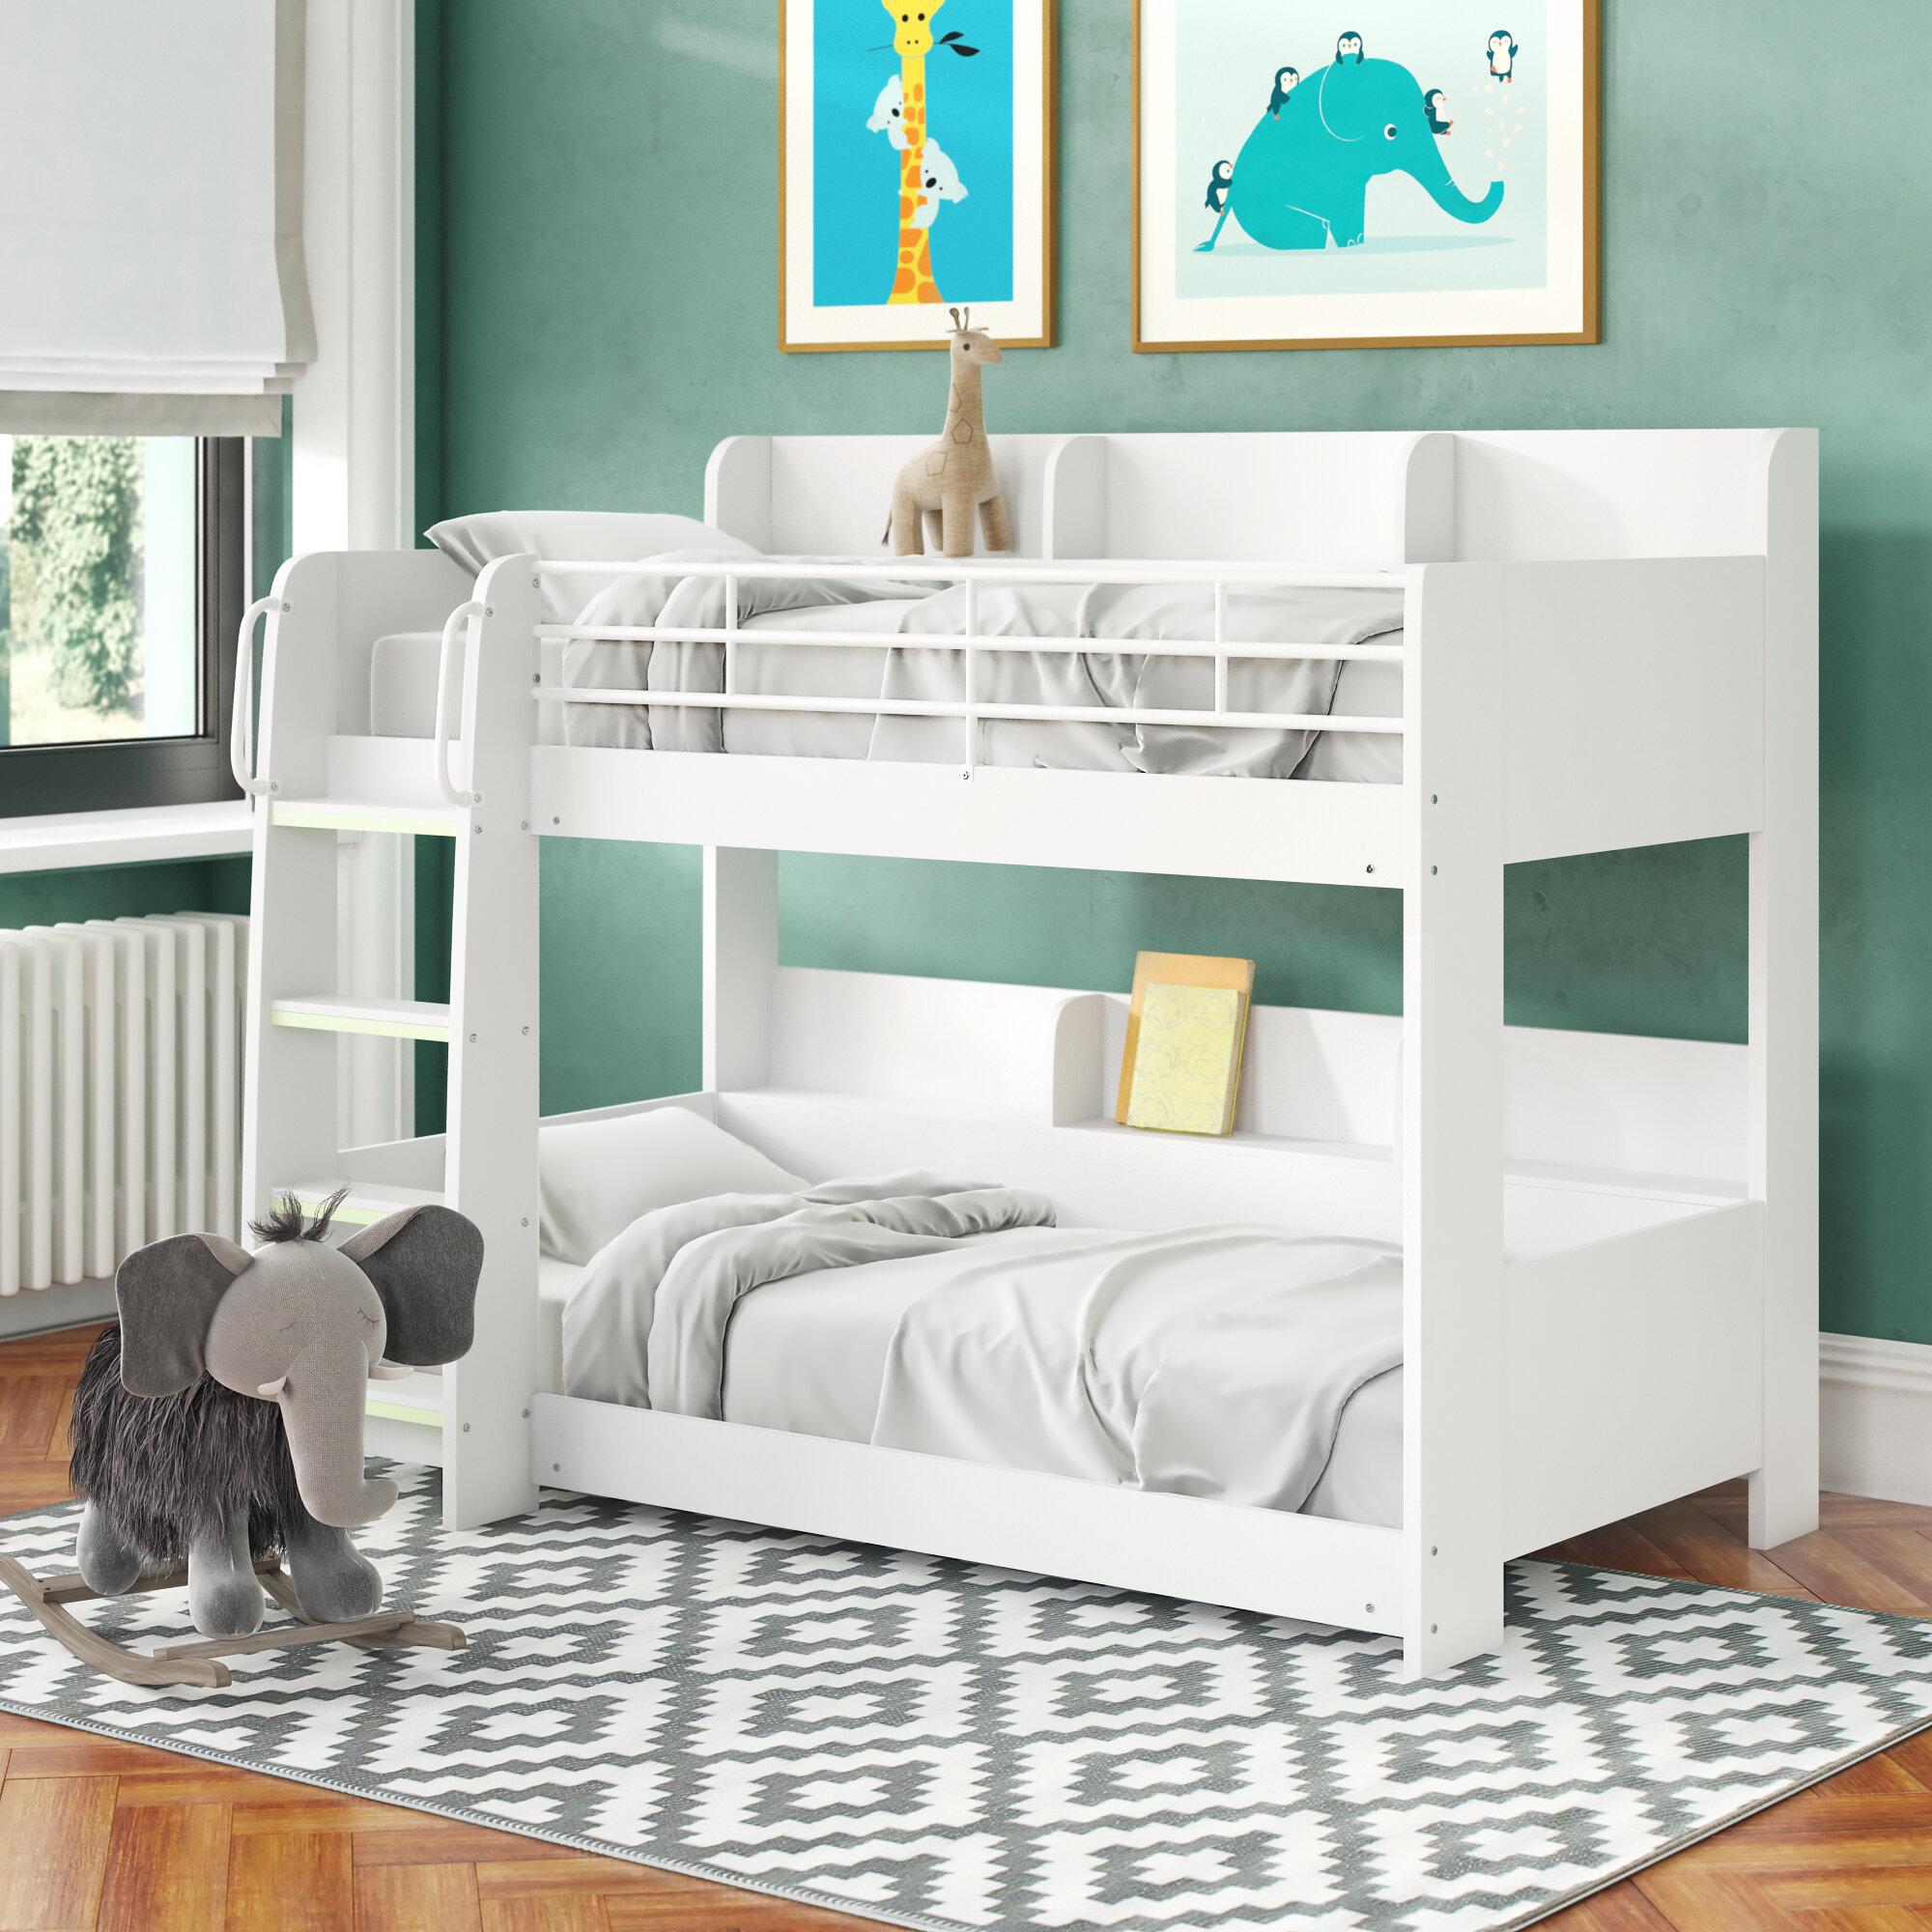 Just Kids Abby Kelly Single Bunk Bed Reviews Wayfair Co Uk